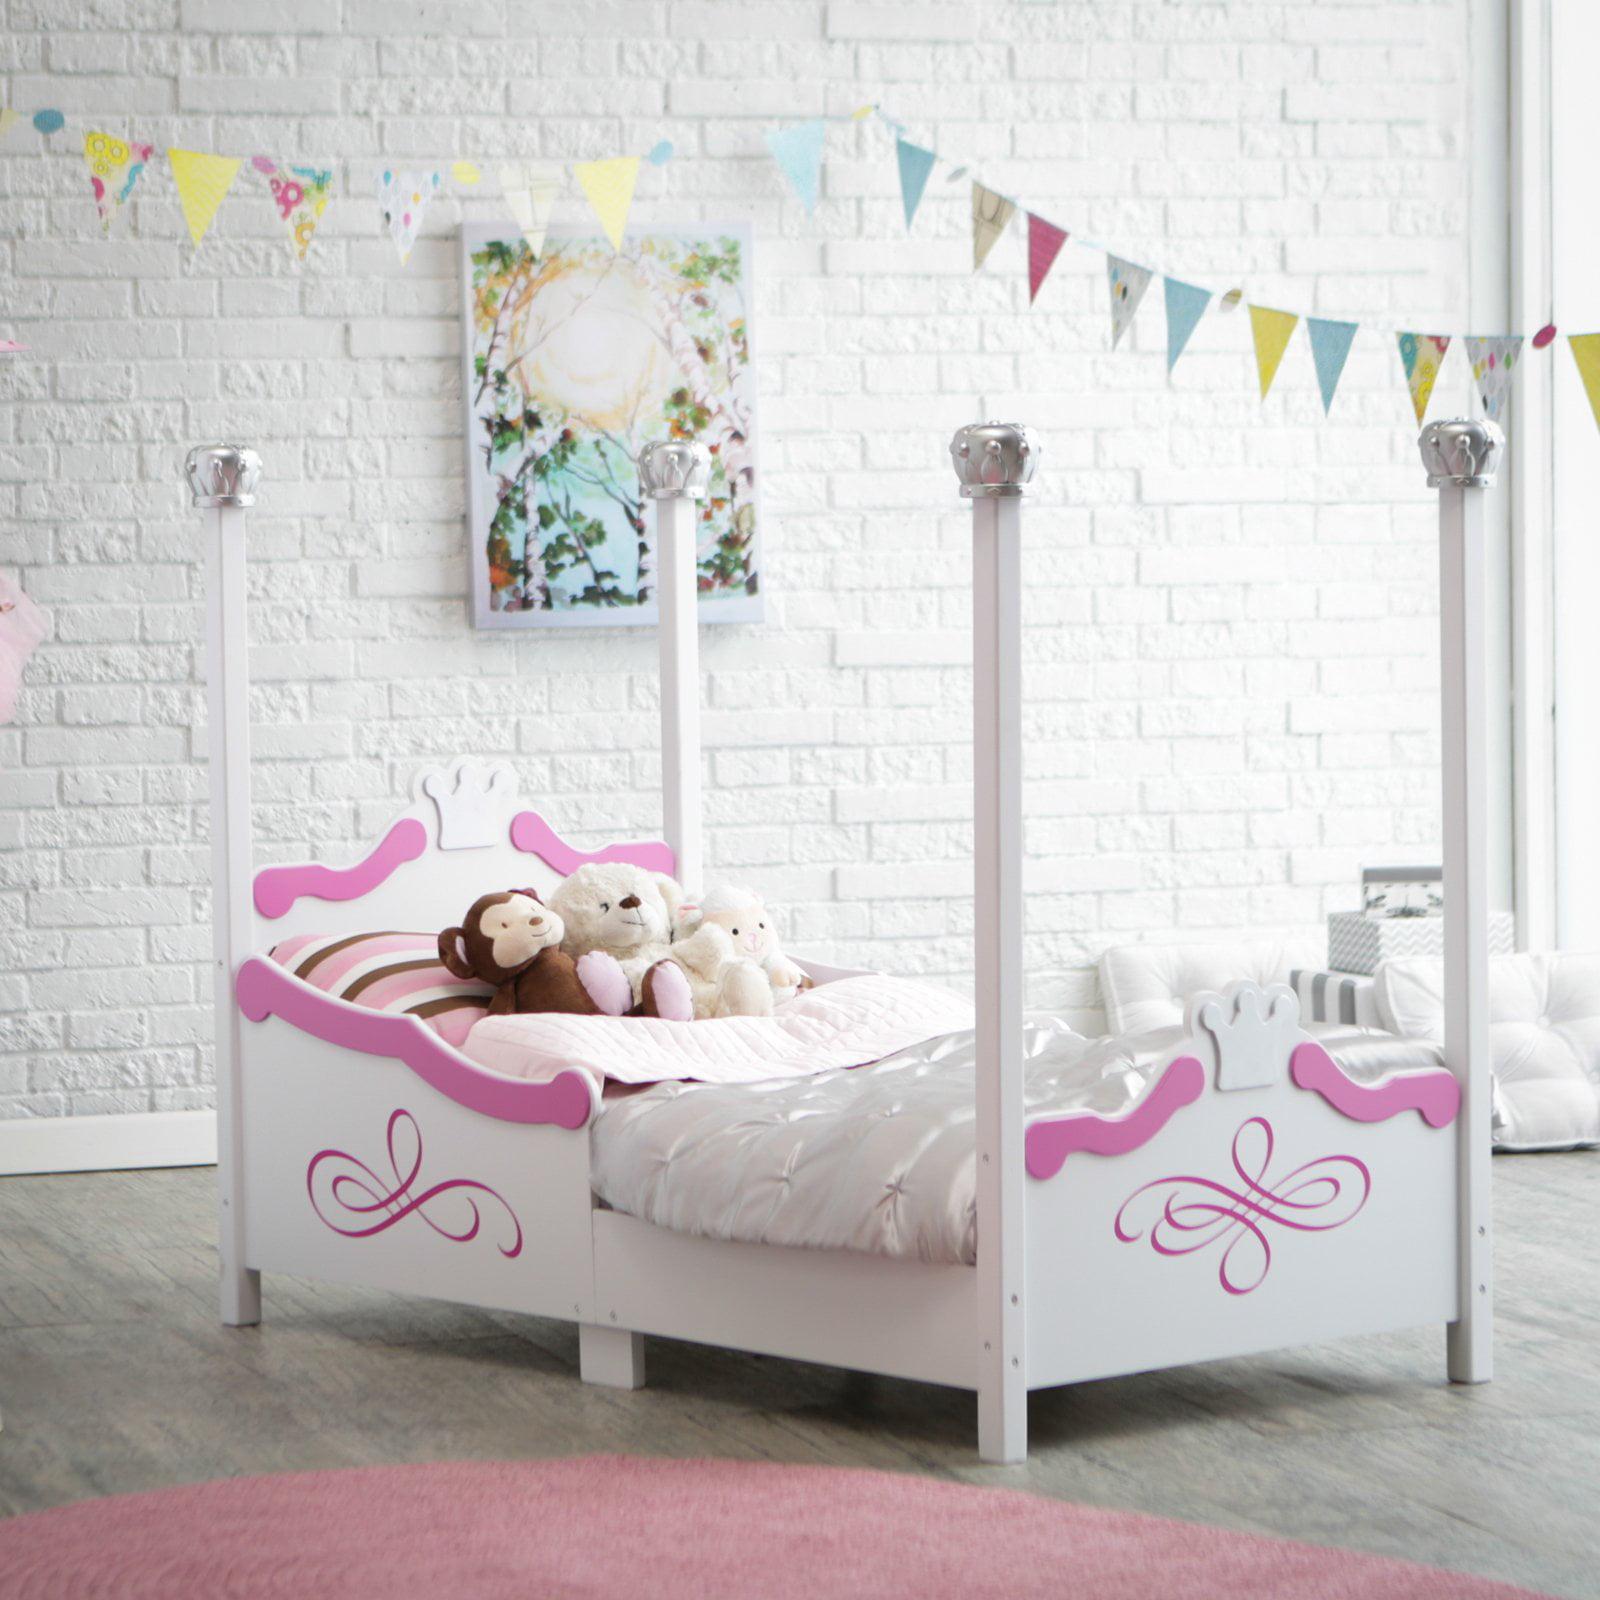 Kidkraft Princess Toddler Bed - Silver - 86945